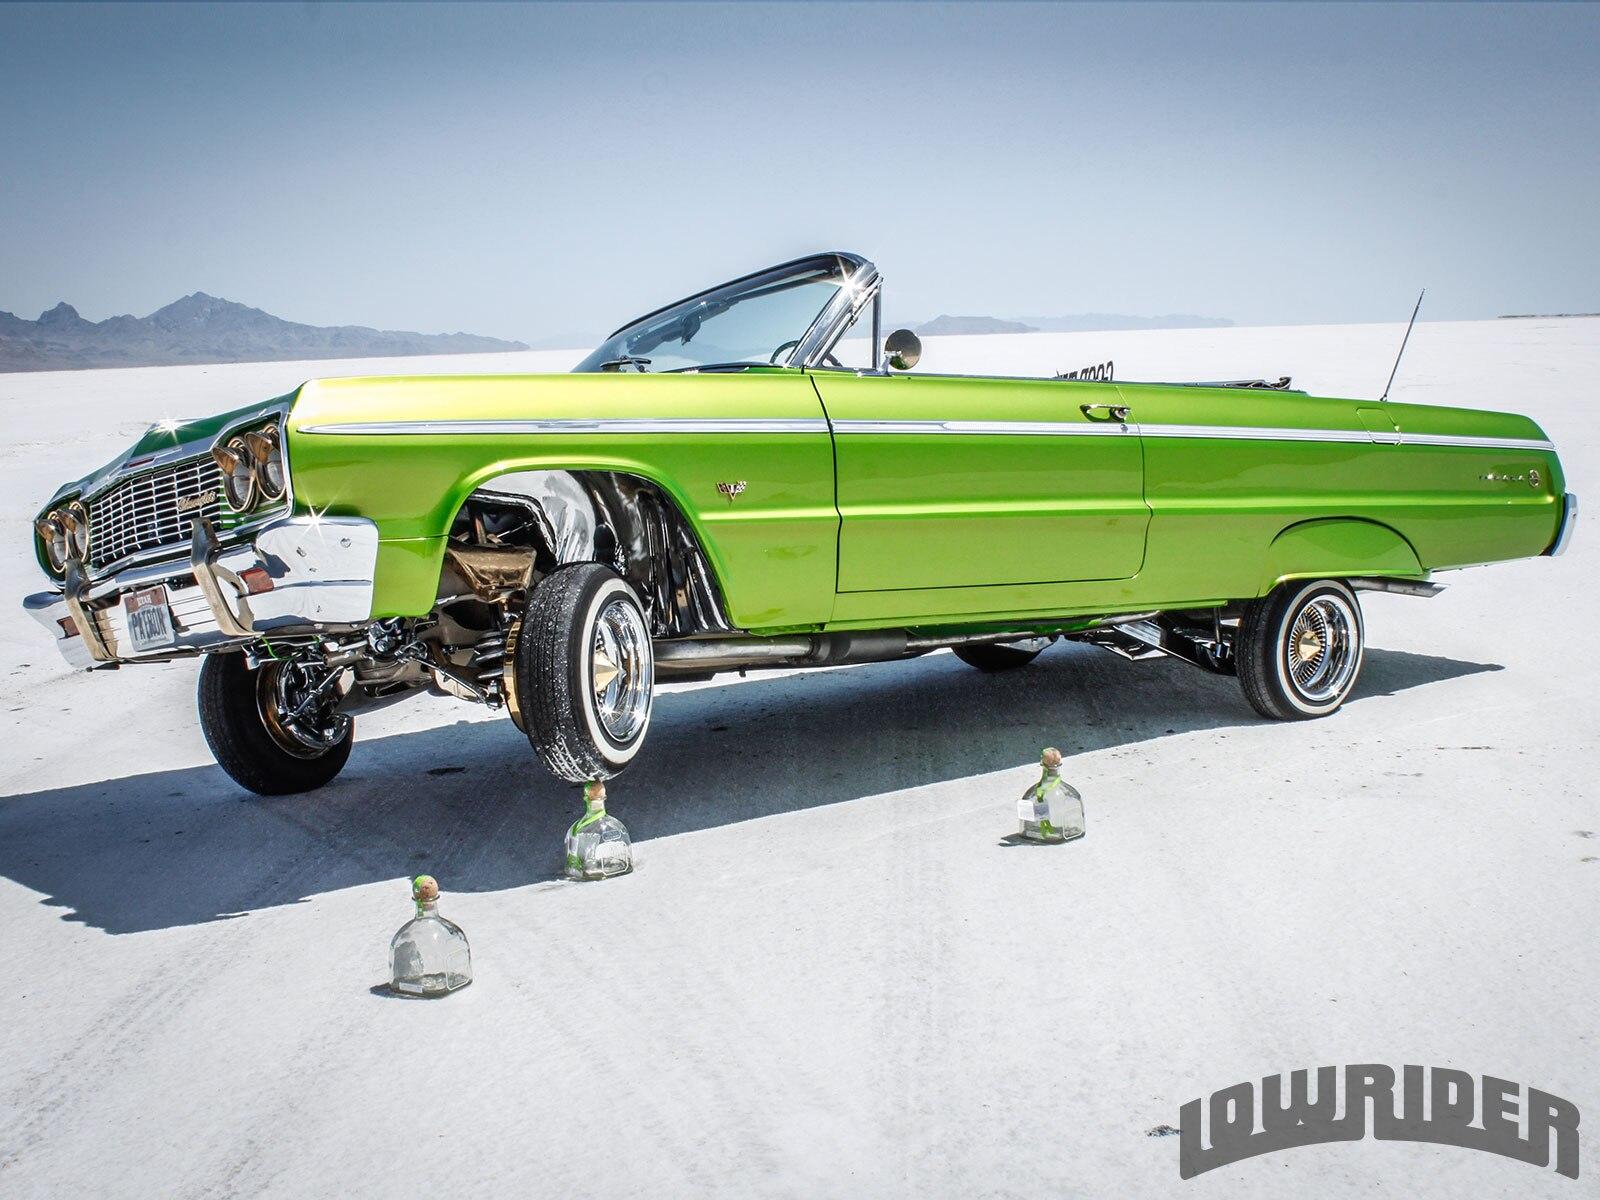 1964 Chevrolet Impala SS Sport Coupe (13/14-47)